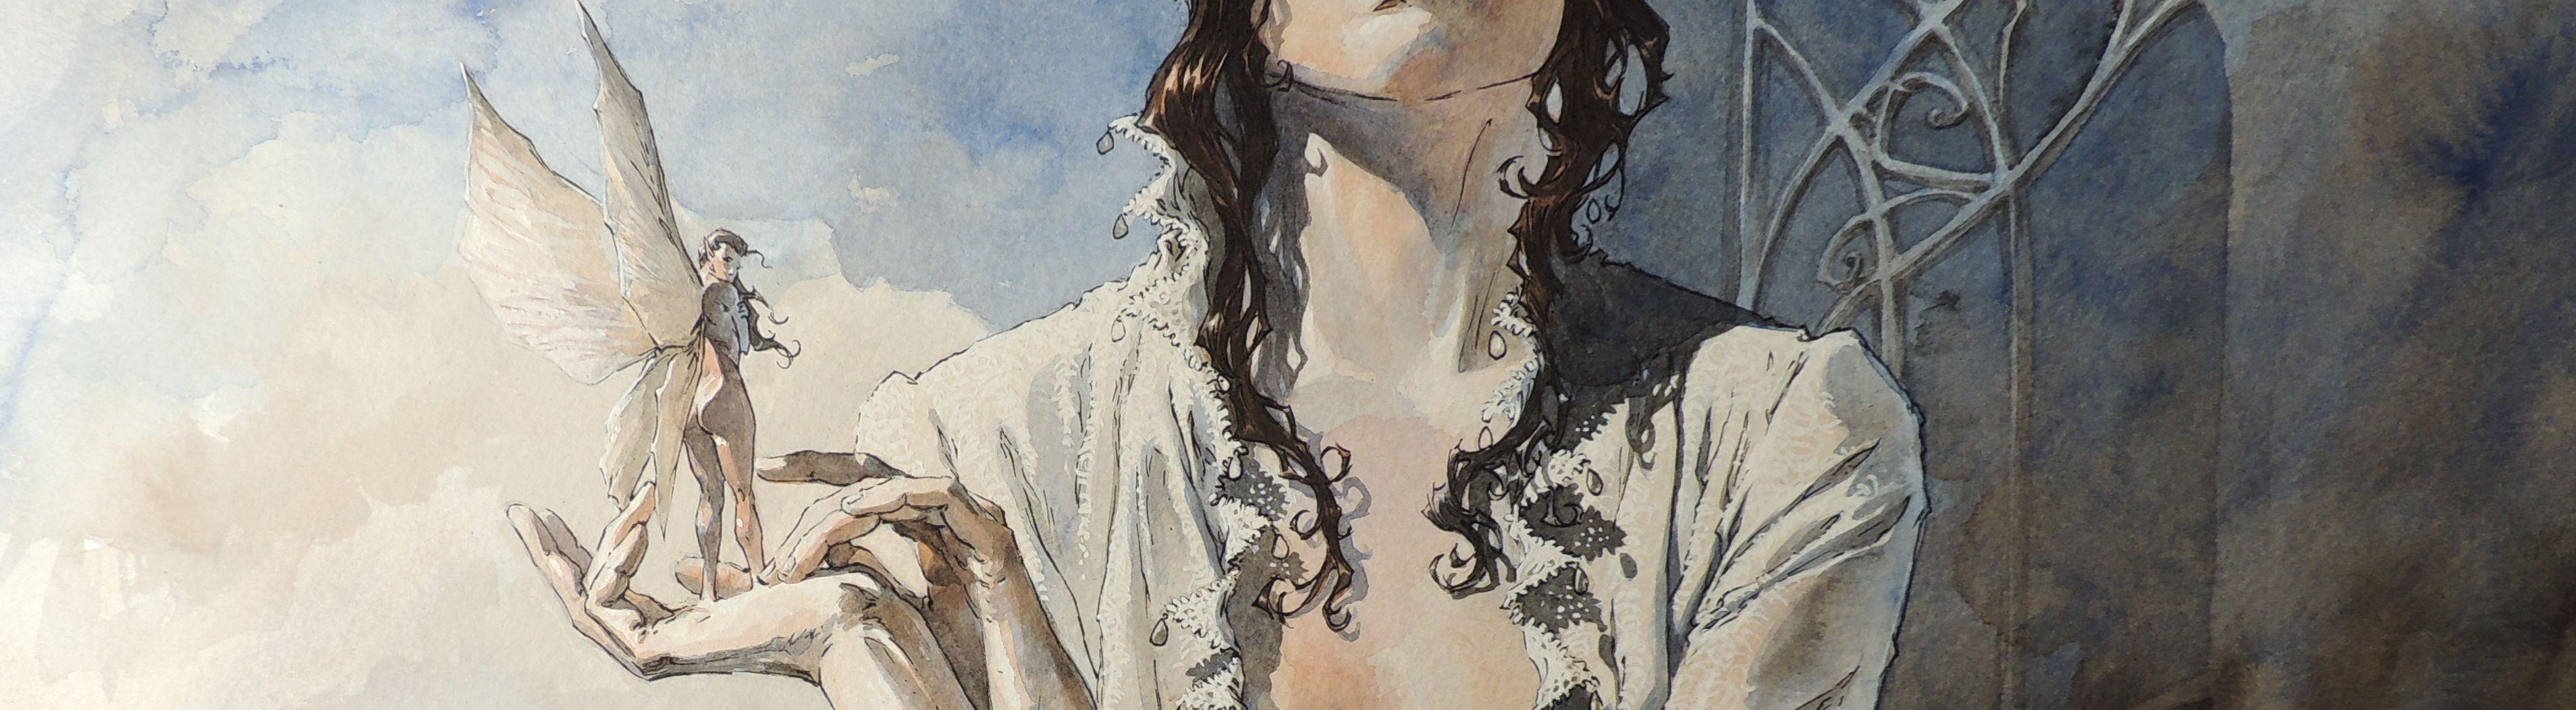 La reine Mab © Guillaume Sorel